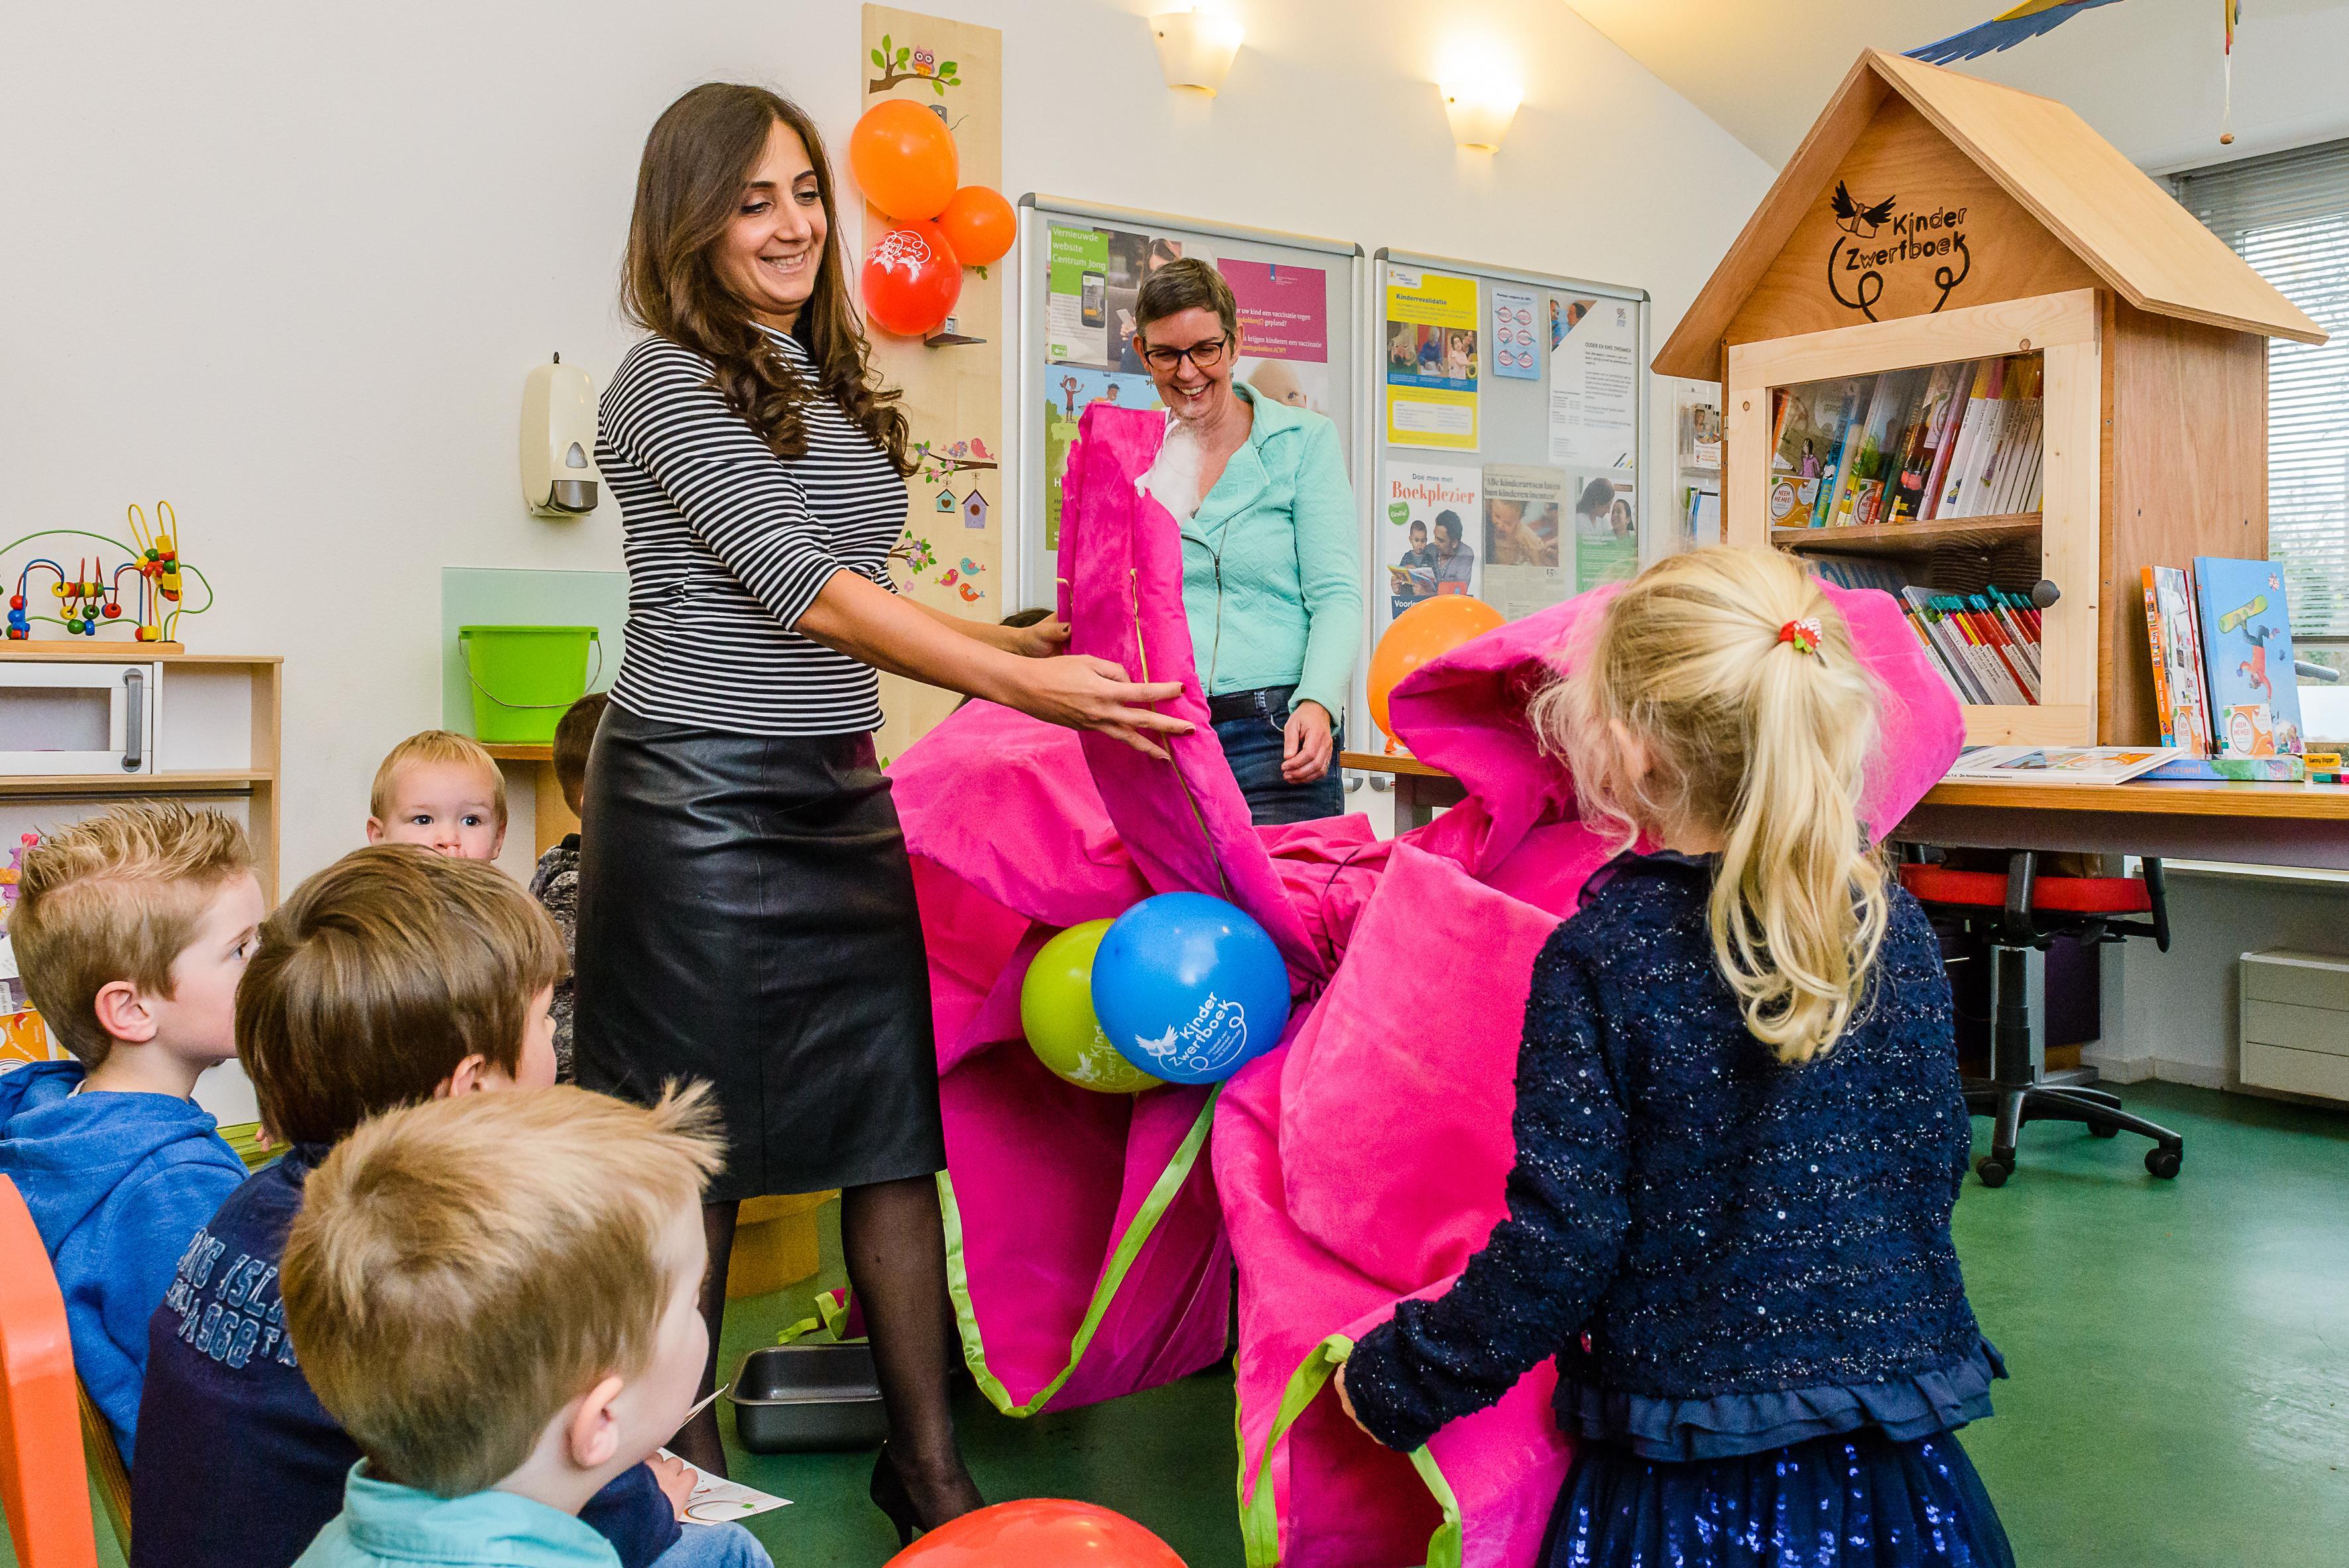 Wethouder opent kinderzwerfboekstations Poelenburg